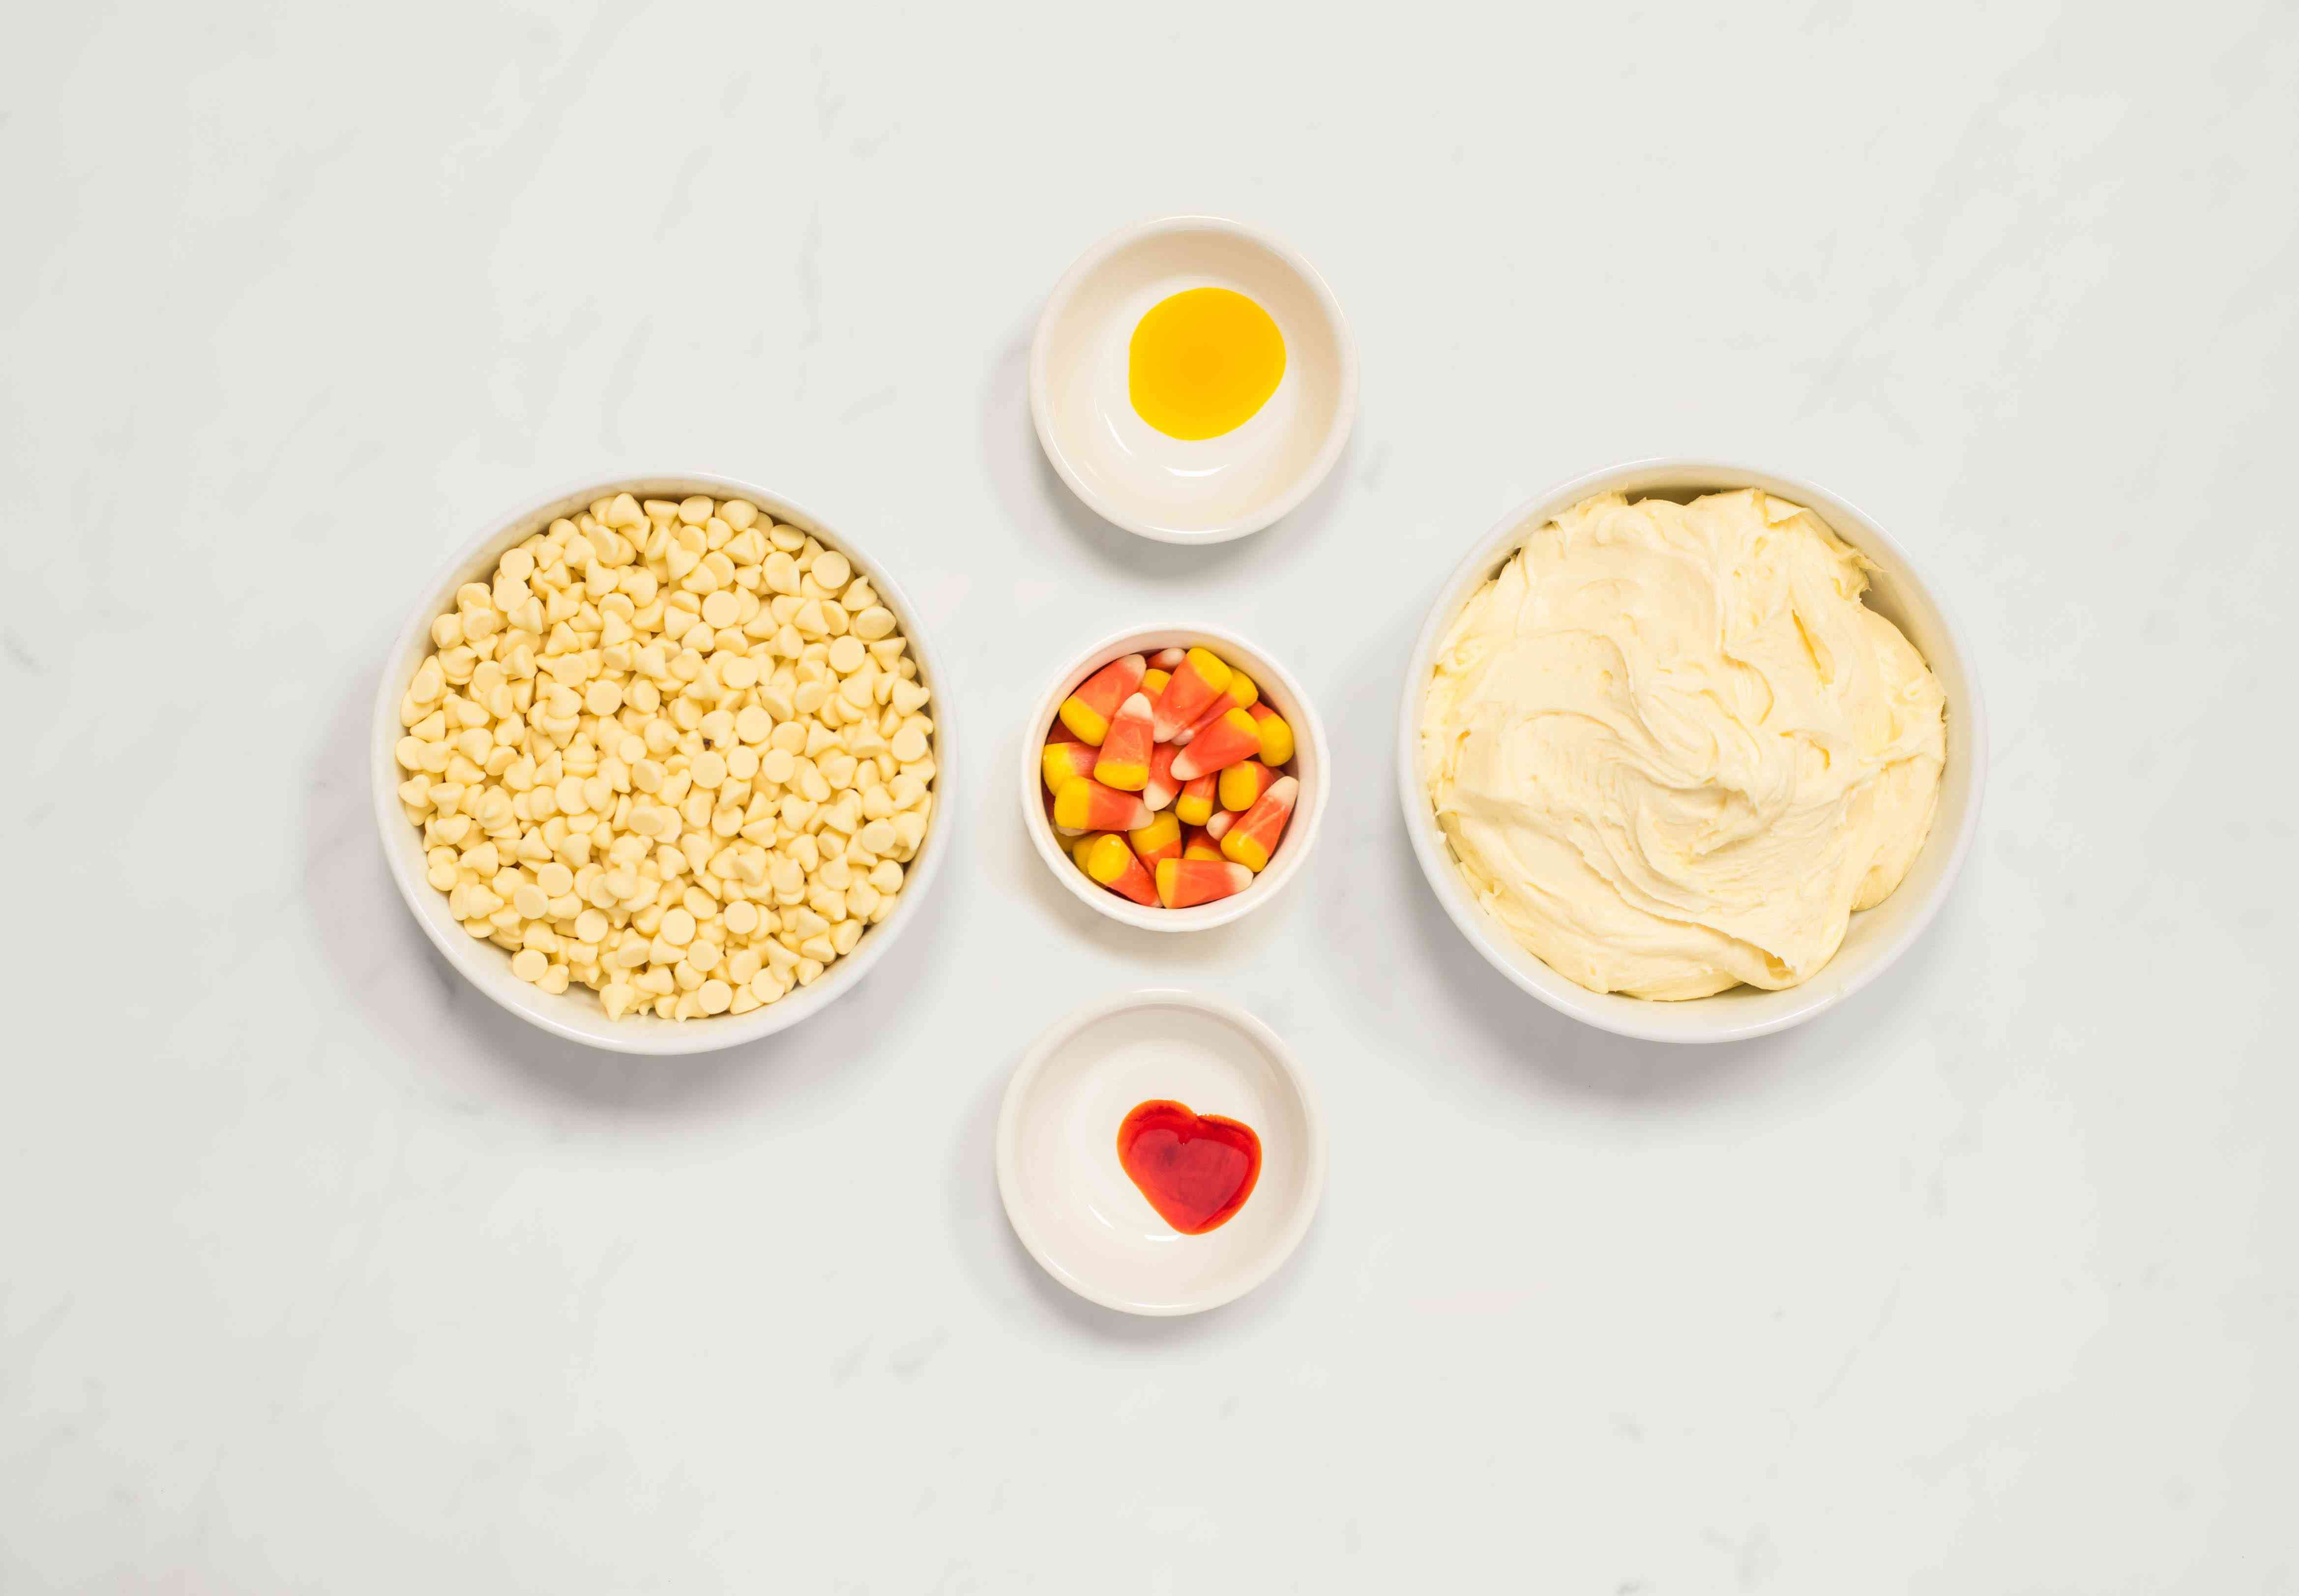 Candy corn fudge ingredients